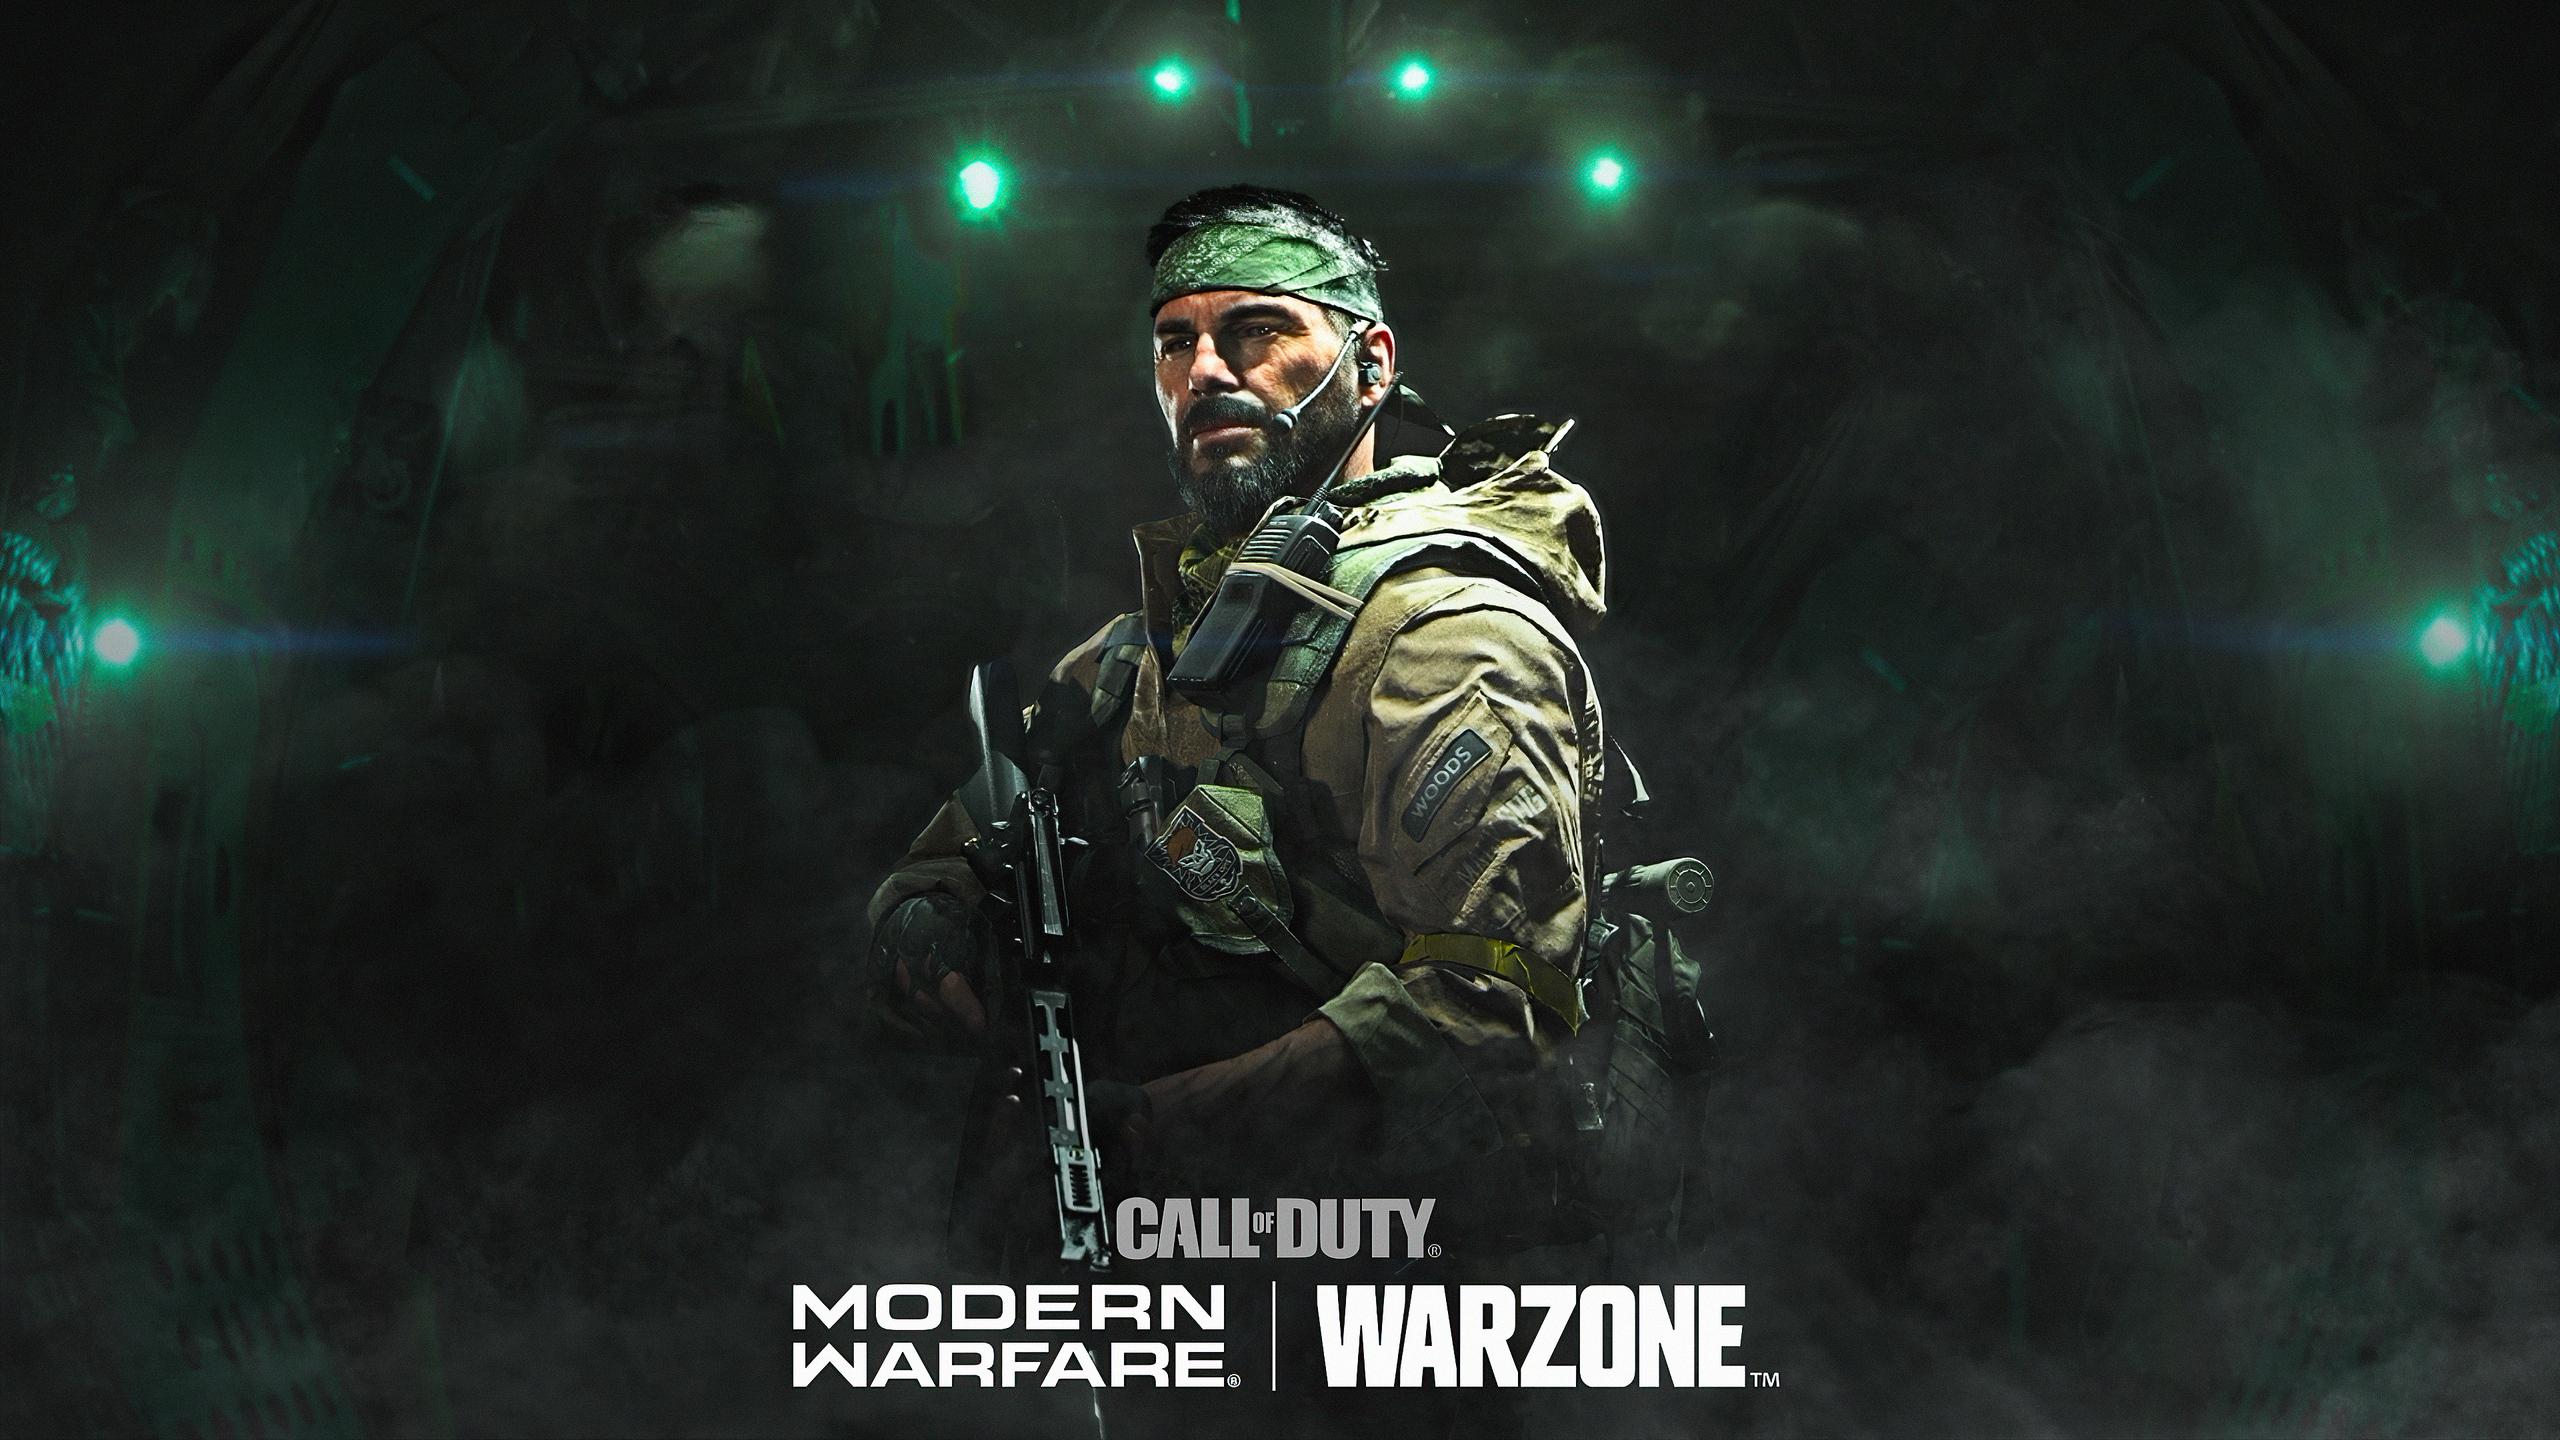 call-of-duty-black-ops-cold-war-4k-ki.jpg